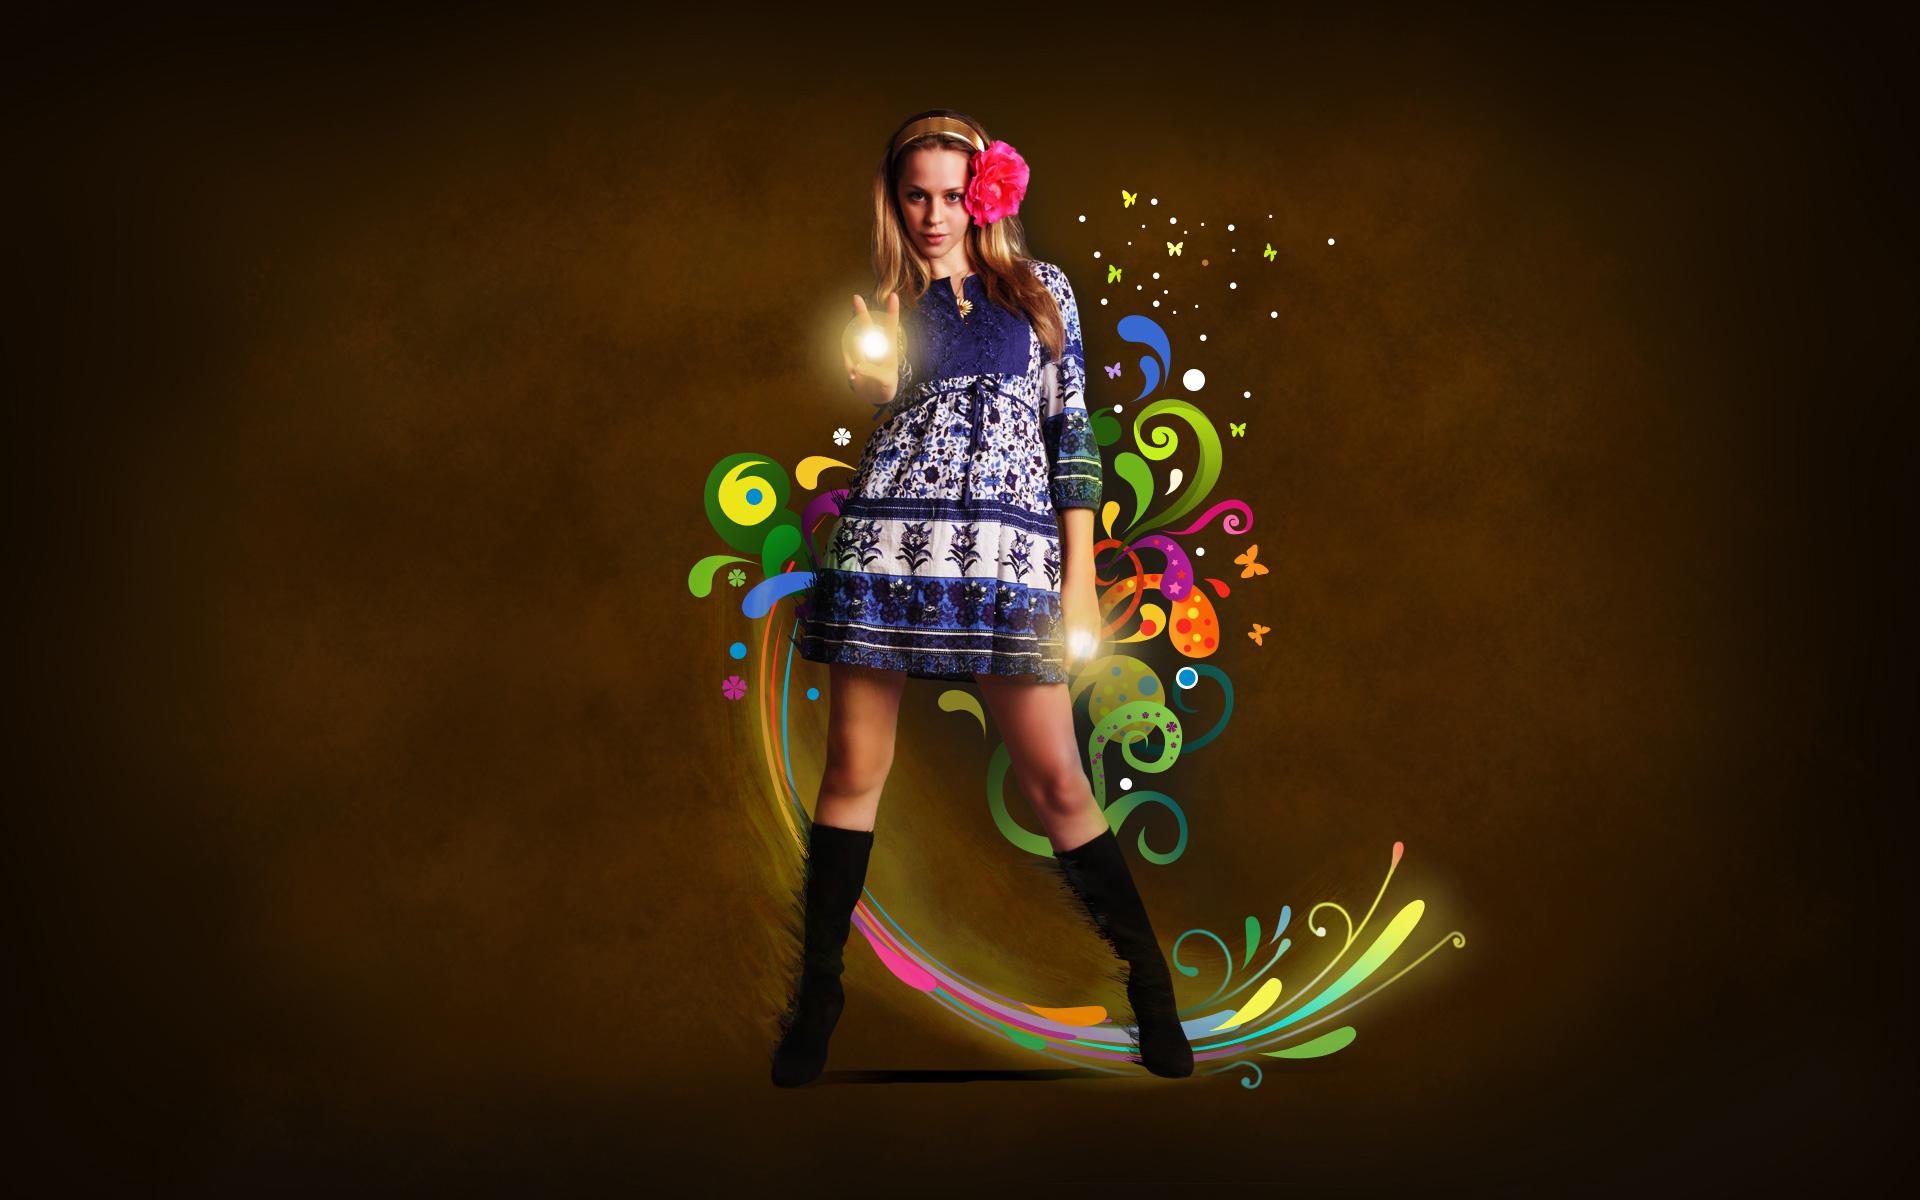 Photoshop Wallpaper Tutorial   1677334 1920x1200